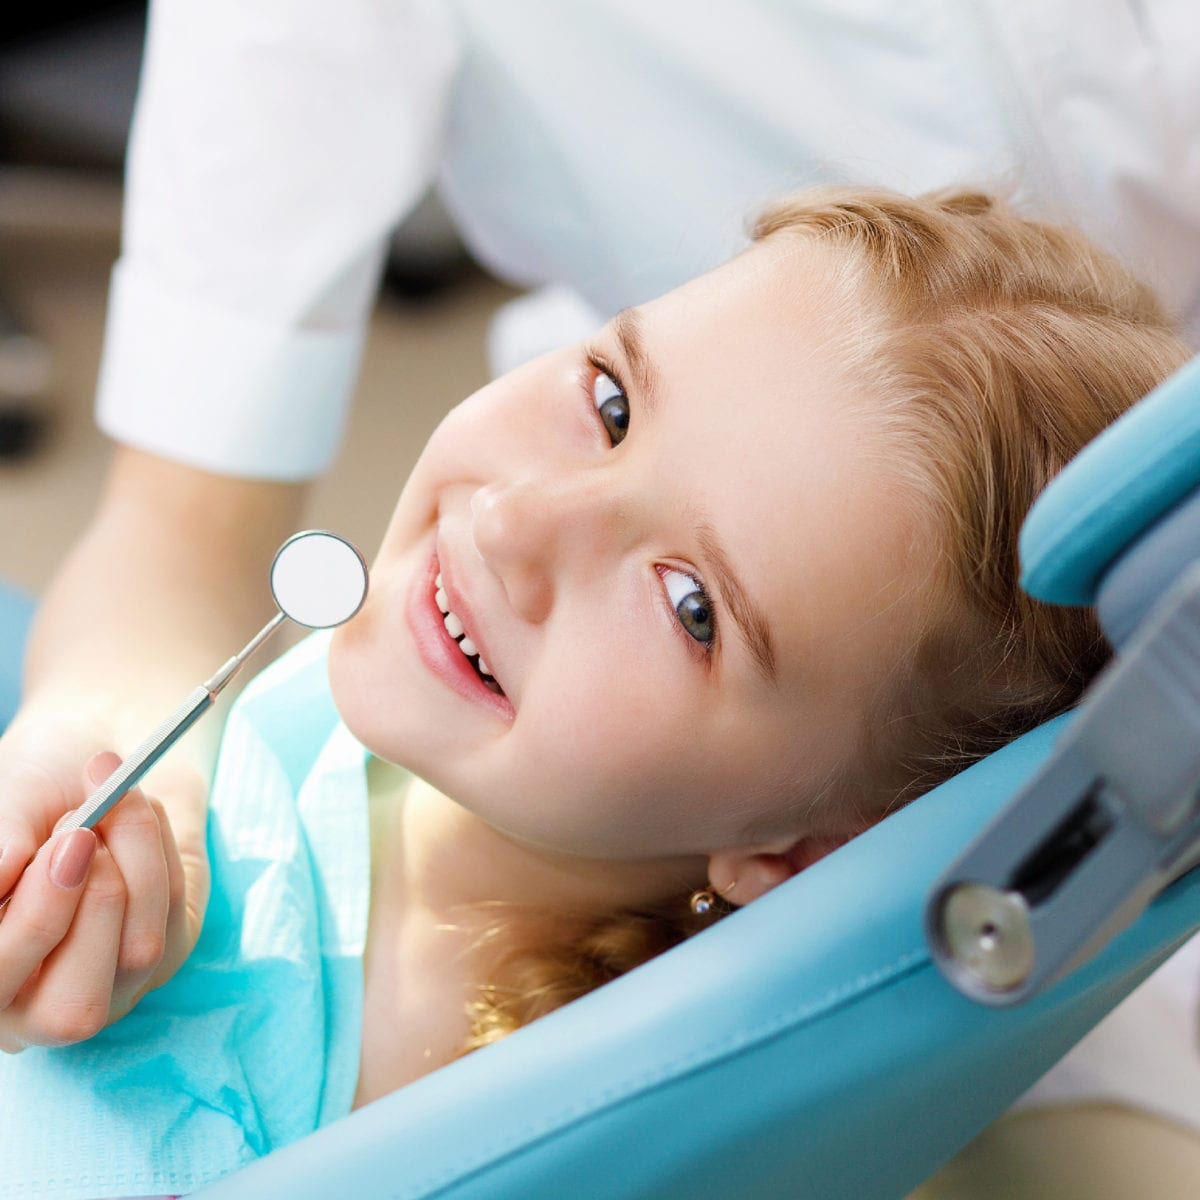 kid-at-dentist-01-1200x1200.jpg